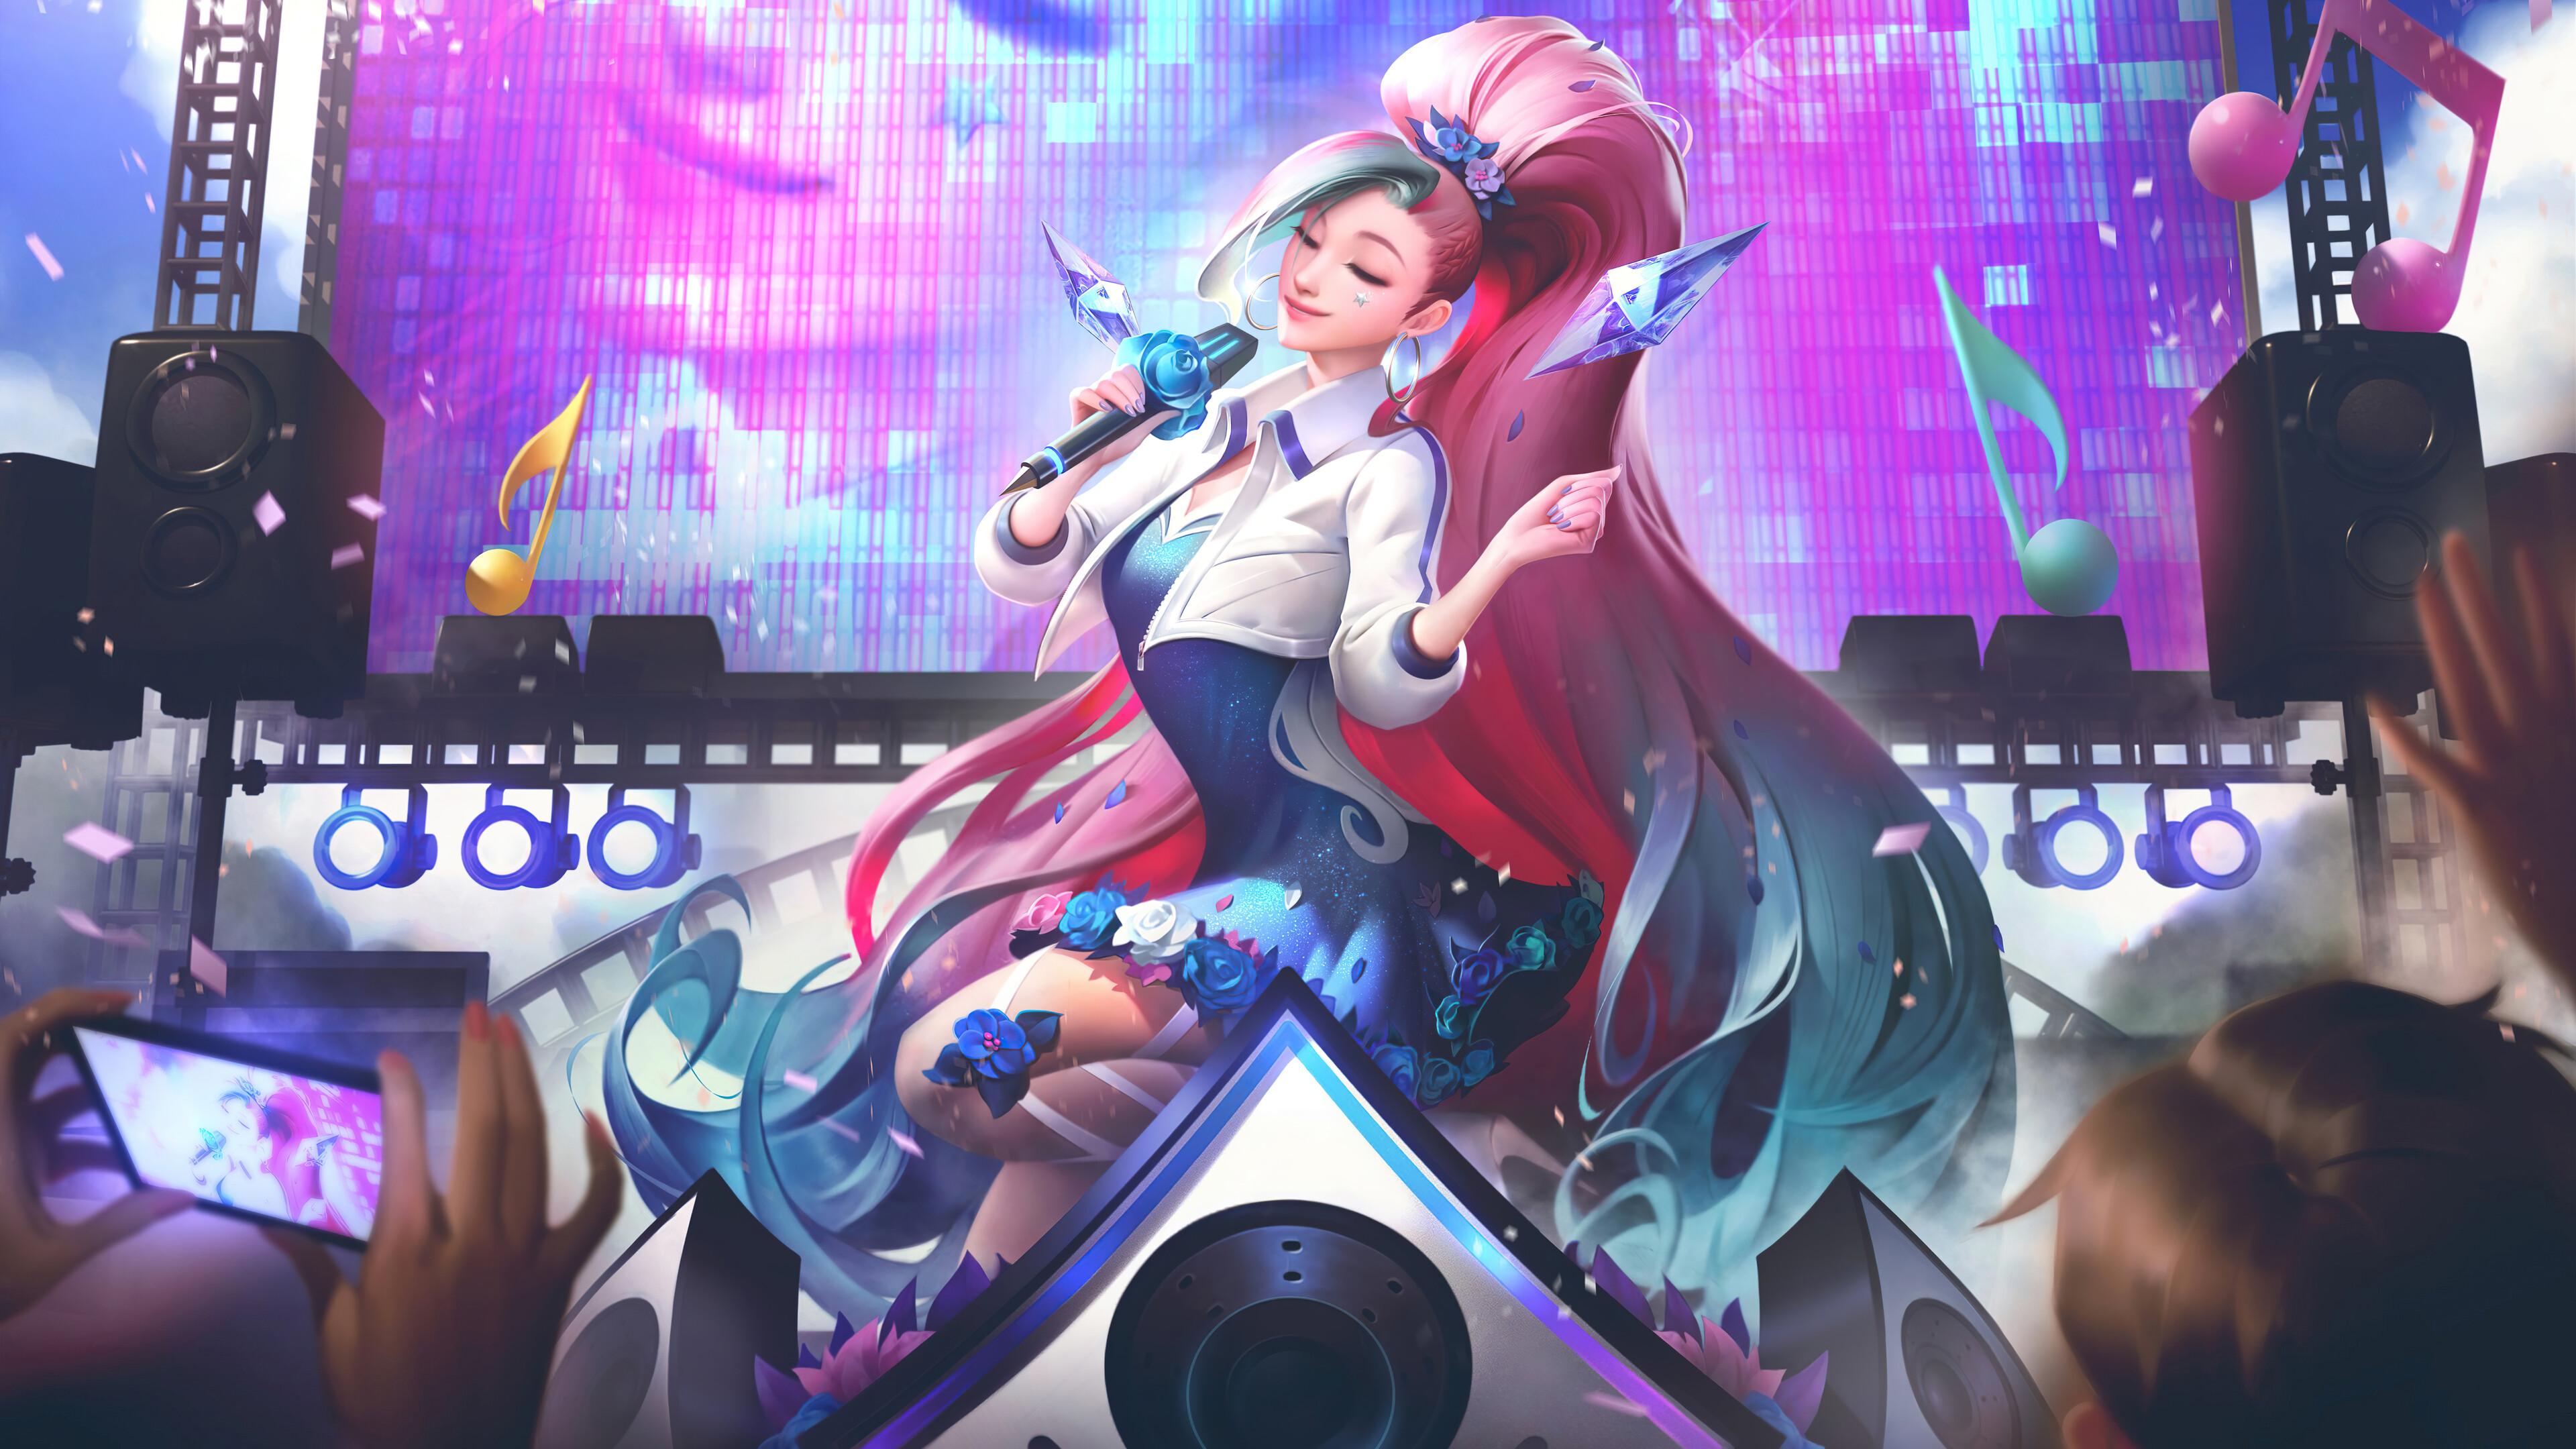 General 3840x2160 Seraphine Seraphine (League of Legends) K/DA kda League of Legends Riot Games music